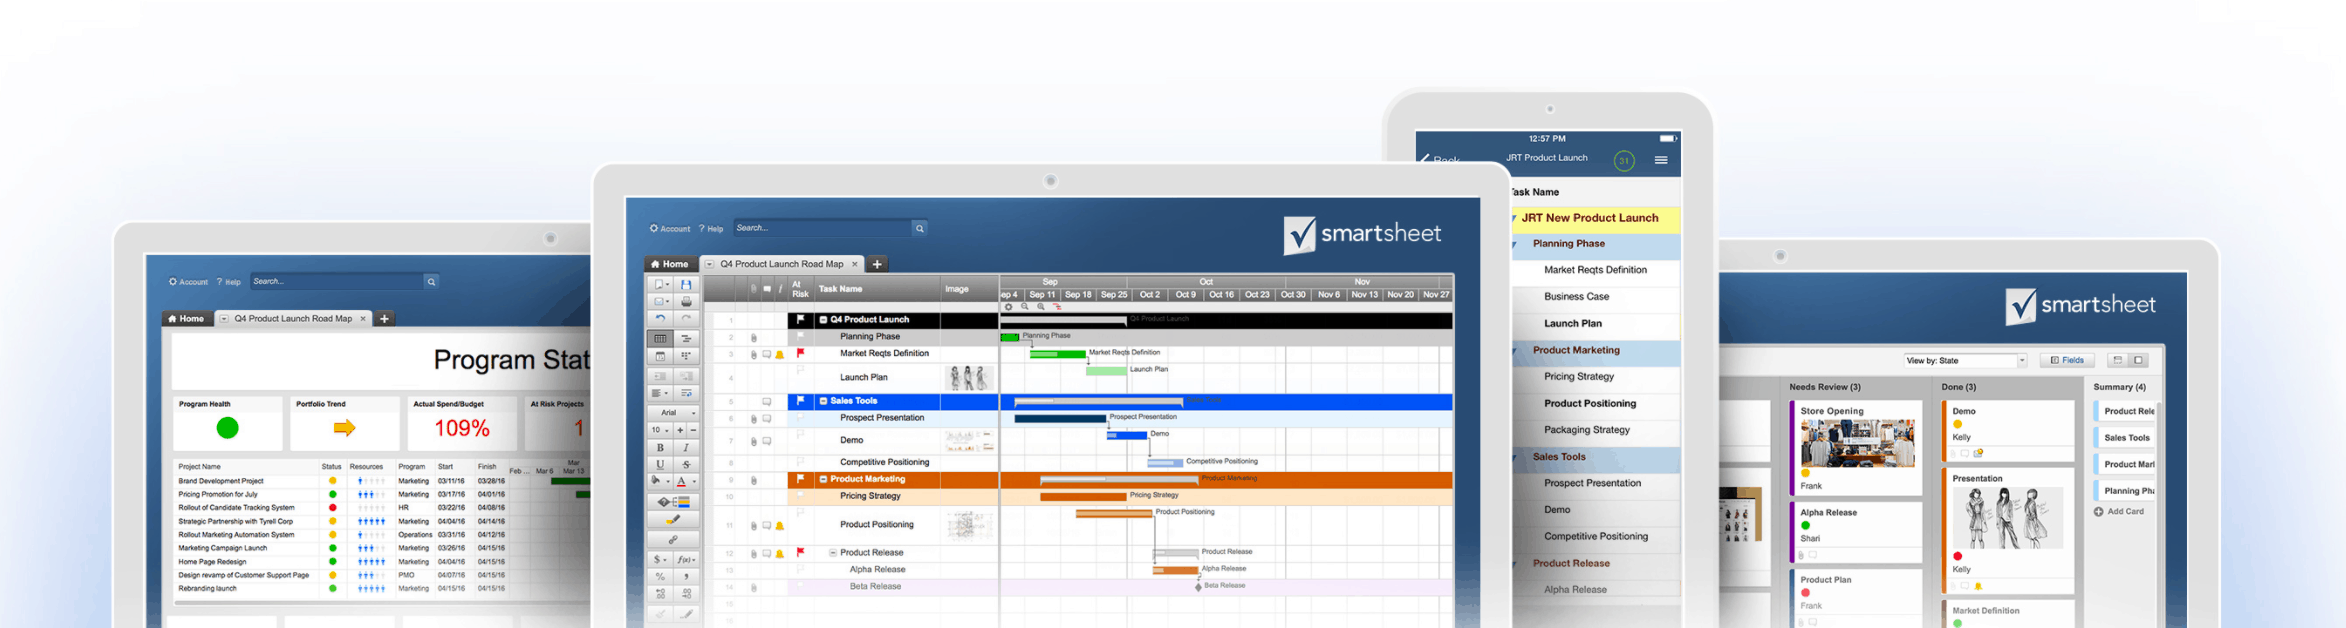 32 free excel spreadsheet templates smartsheet ic views png